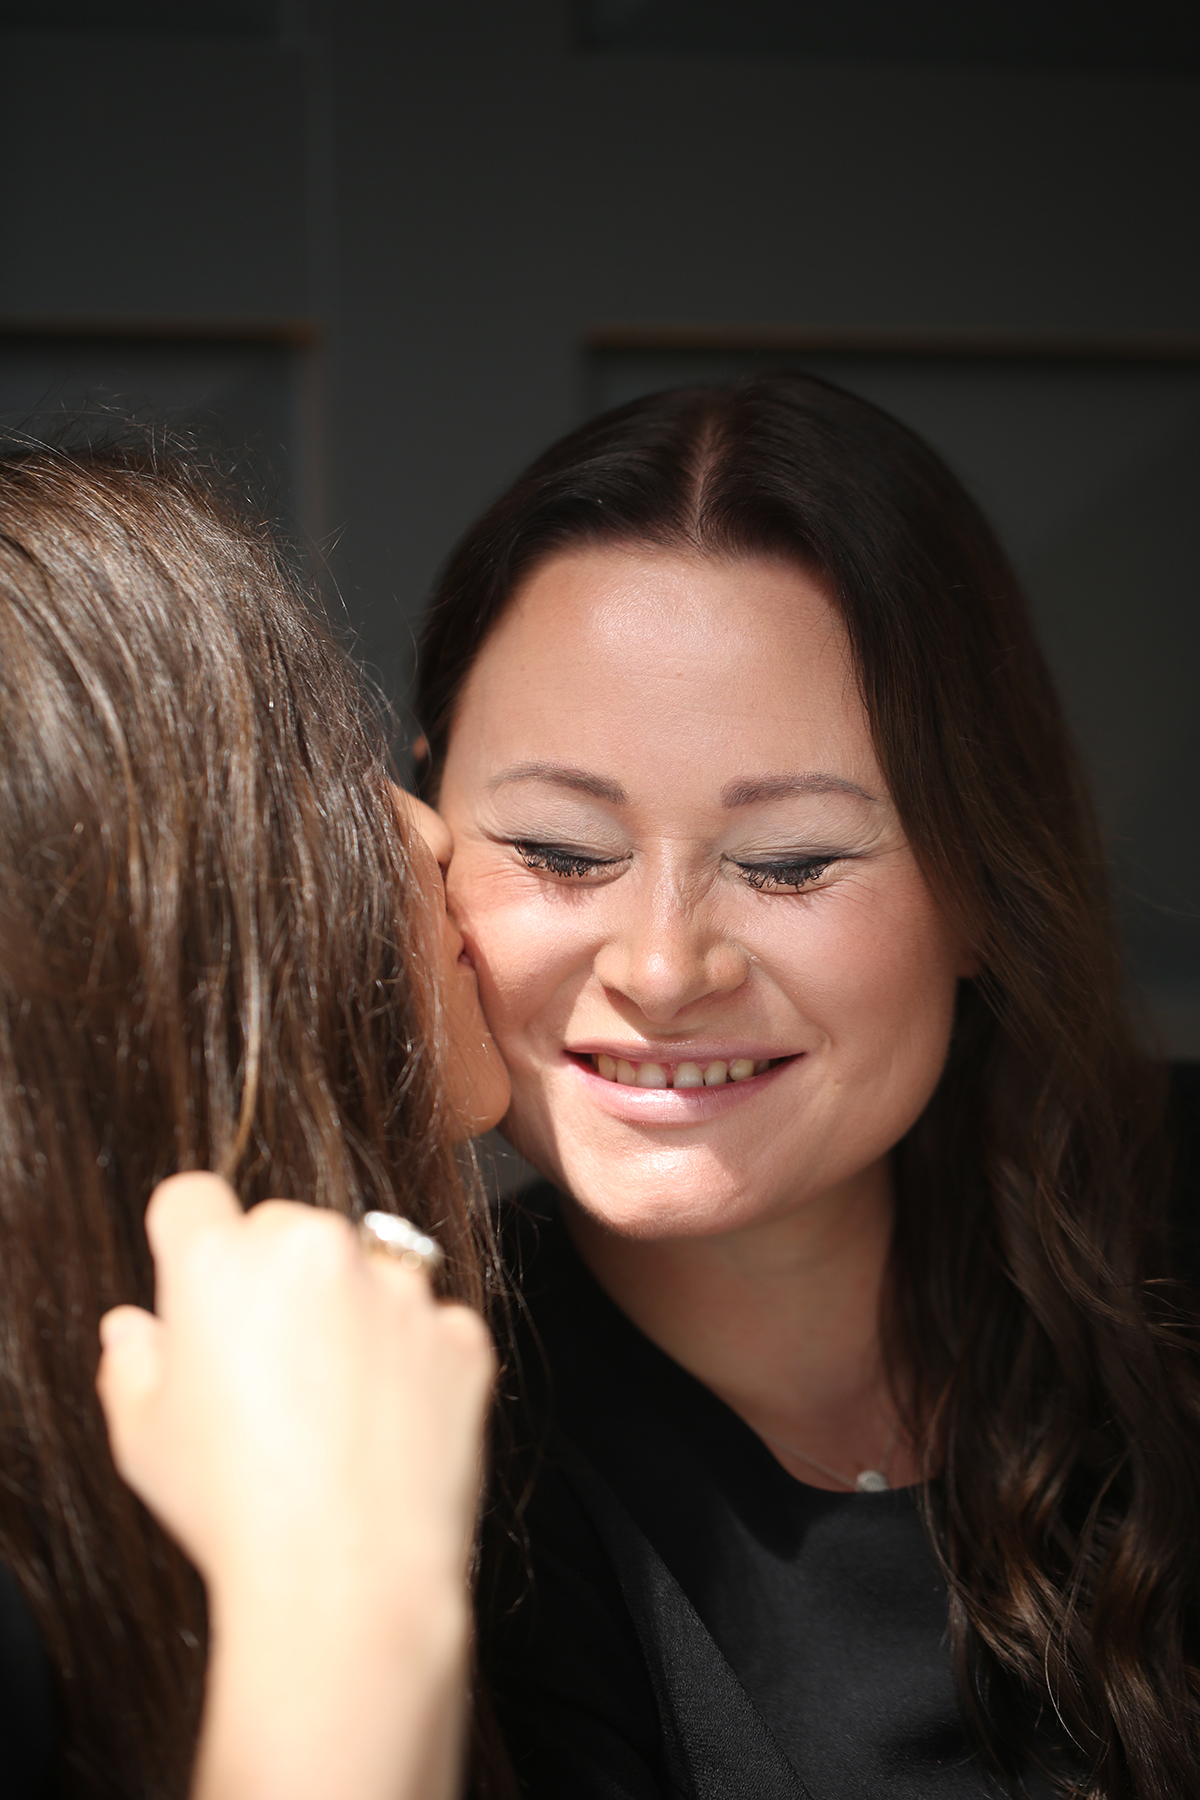 Avec Sofié blog - podcast: ystävät kuin sisarukset